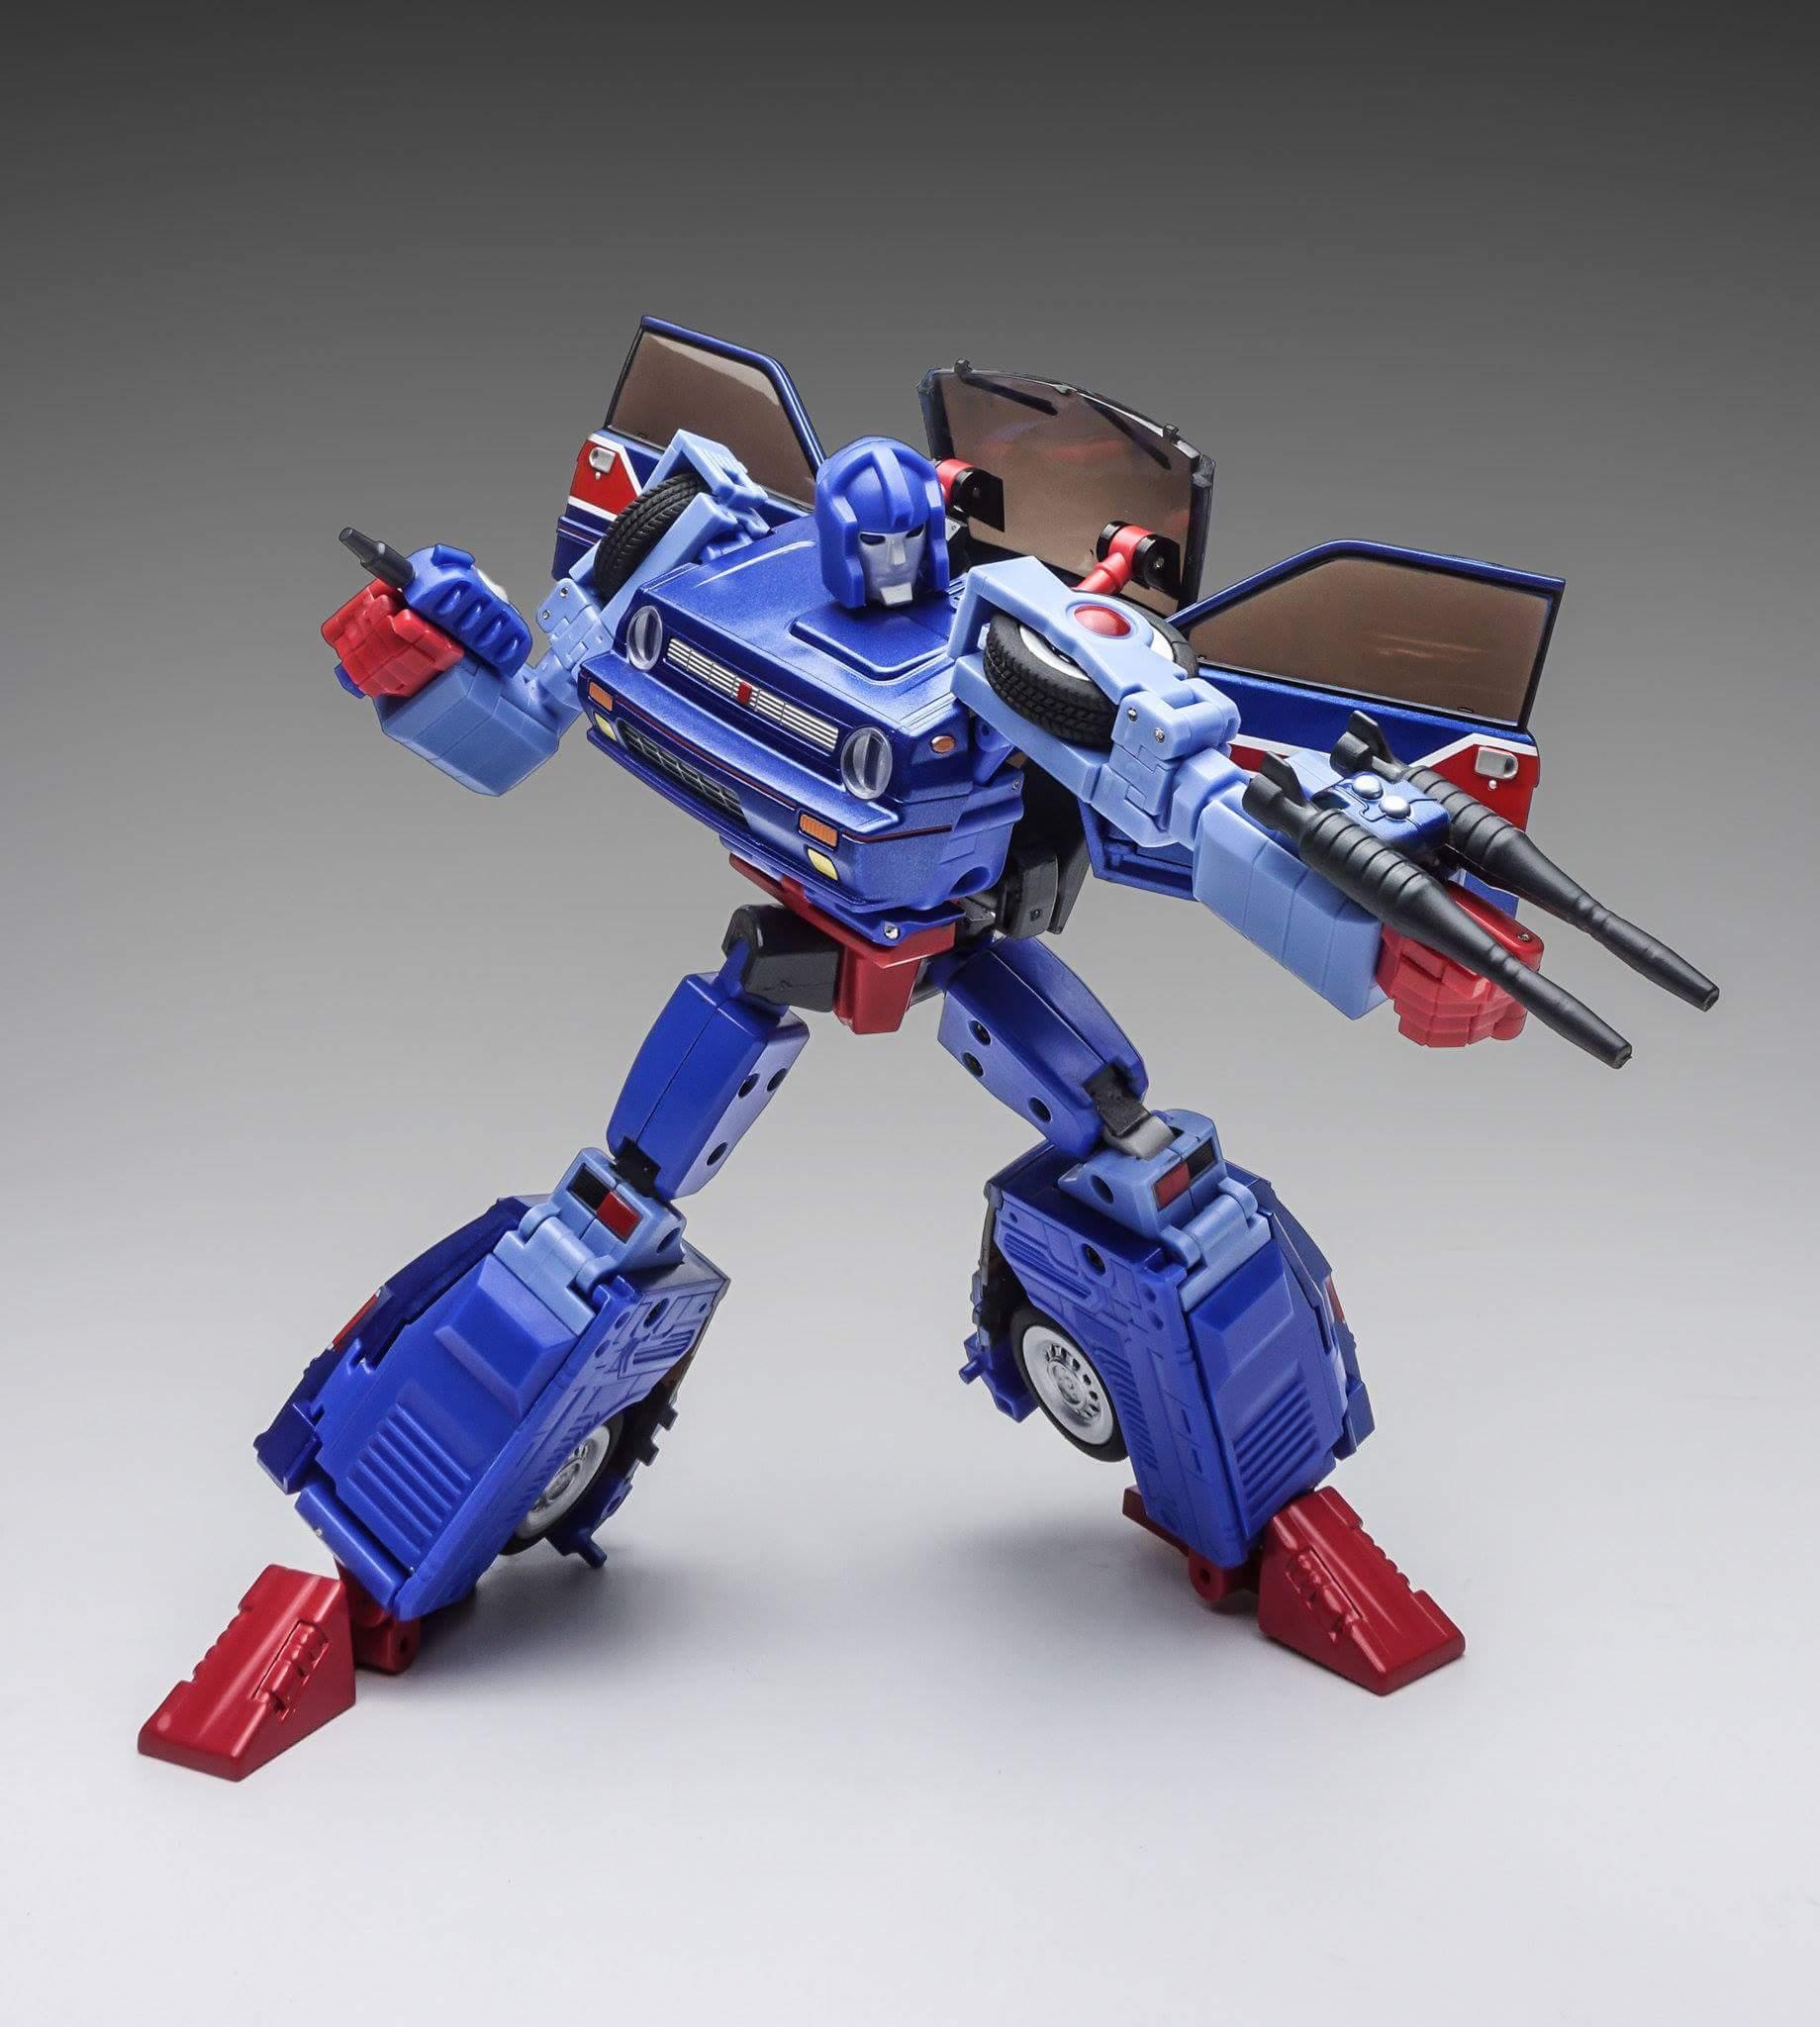 [X-Transbots] Produit Tiers - Jouet MX-XVII Savant (aka Skids/Platon) + MX-17H Herald (aka Crosscut/Transversal) + MX-17T Taiho (Hommage YUA) SRLOMLxe_o